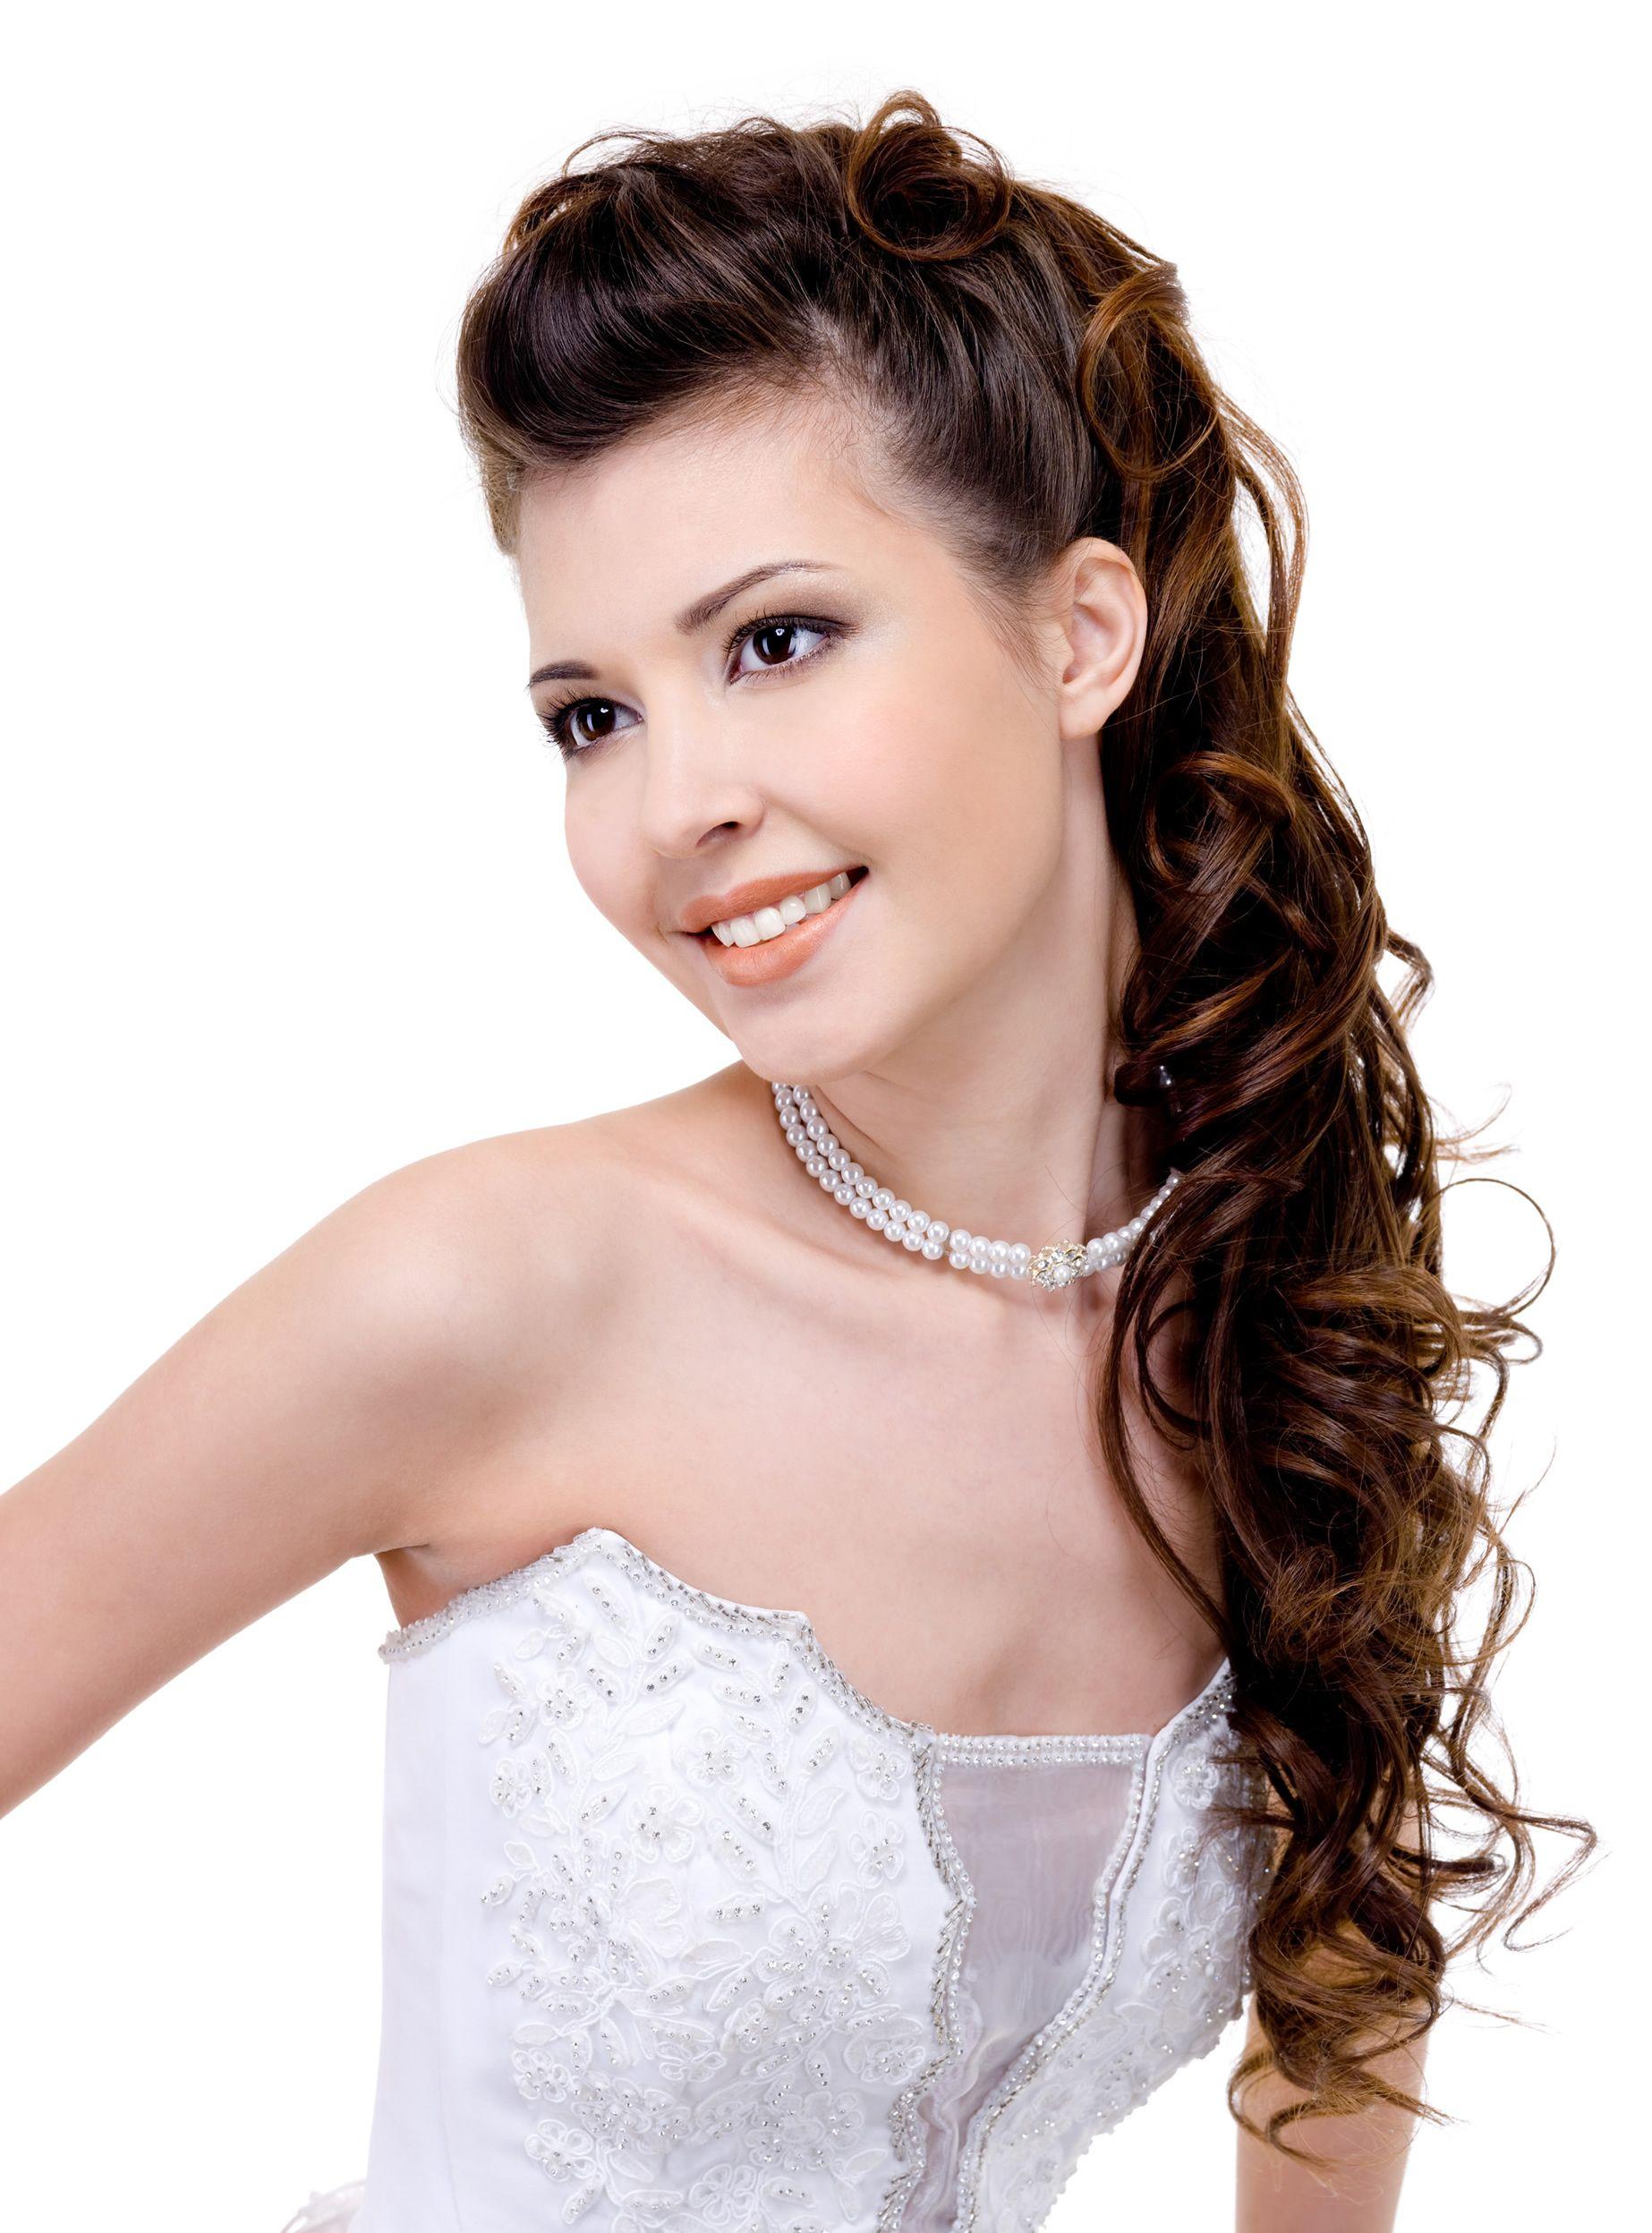 penteados para noiva - Pesquisa do Google   beleza   Pinterest ...